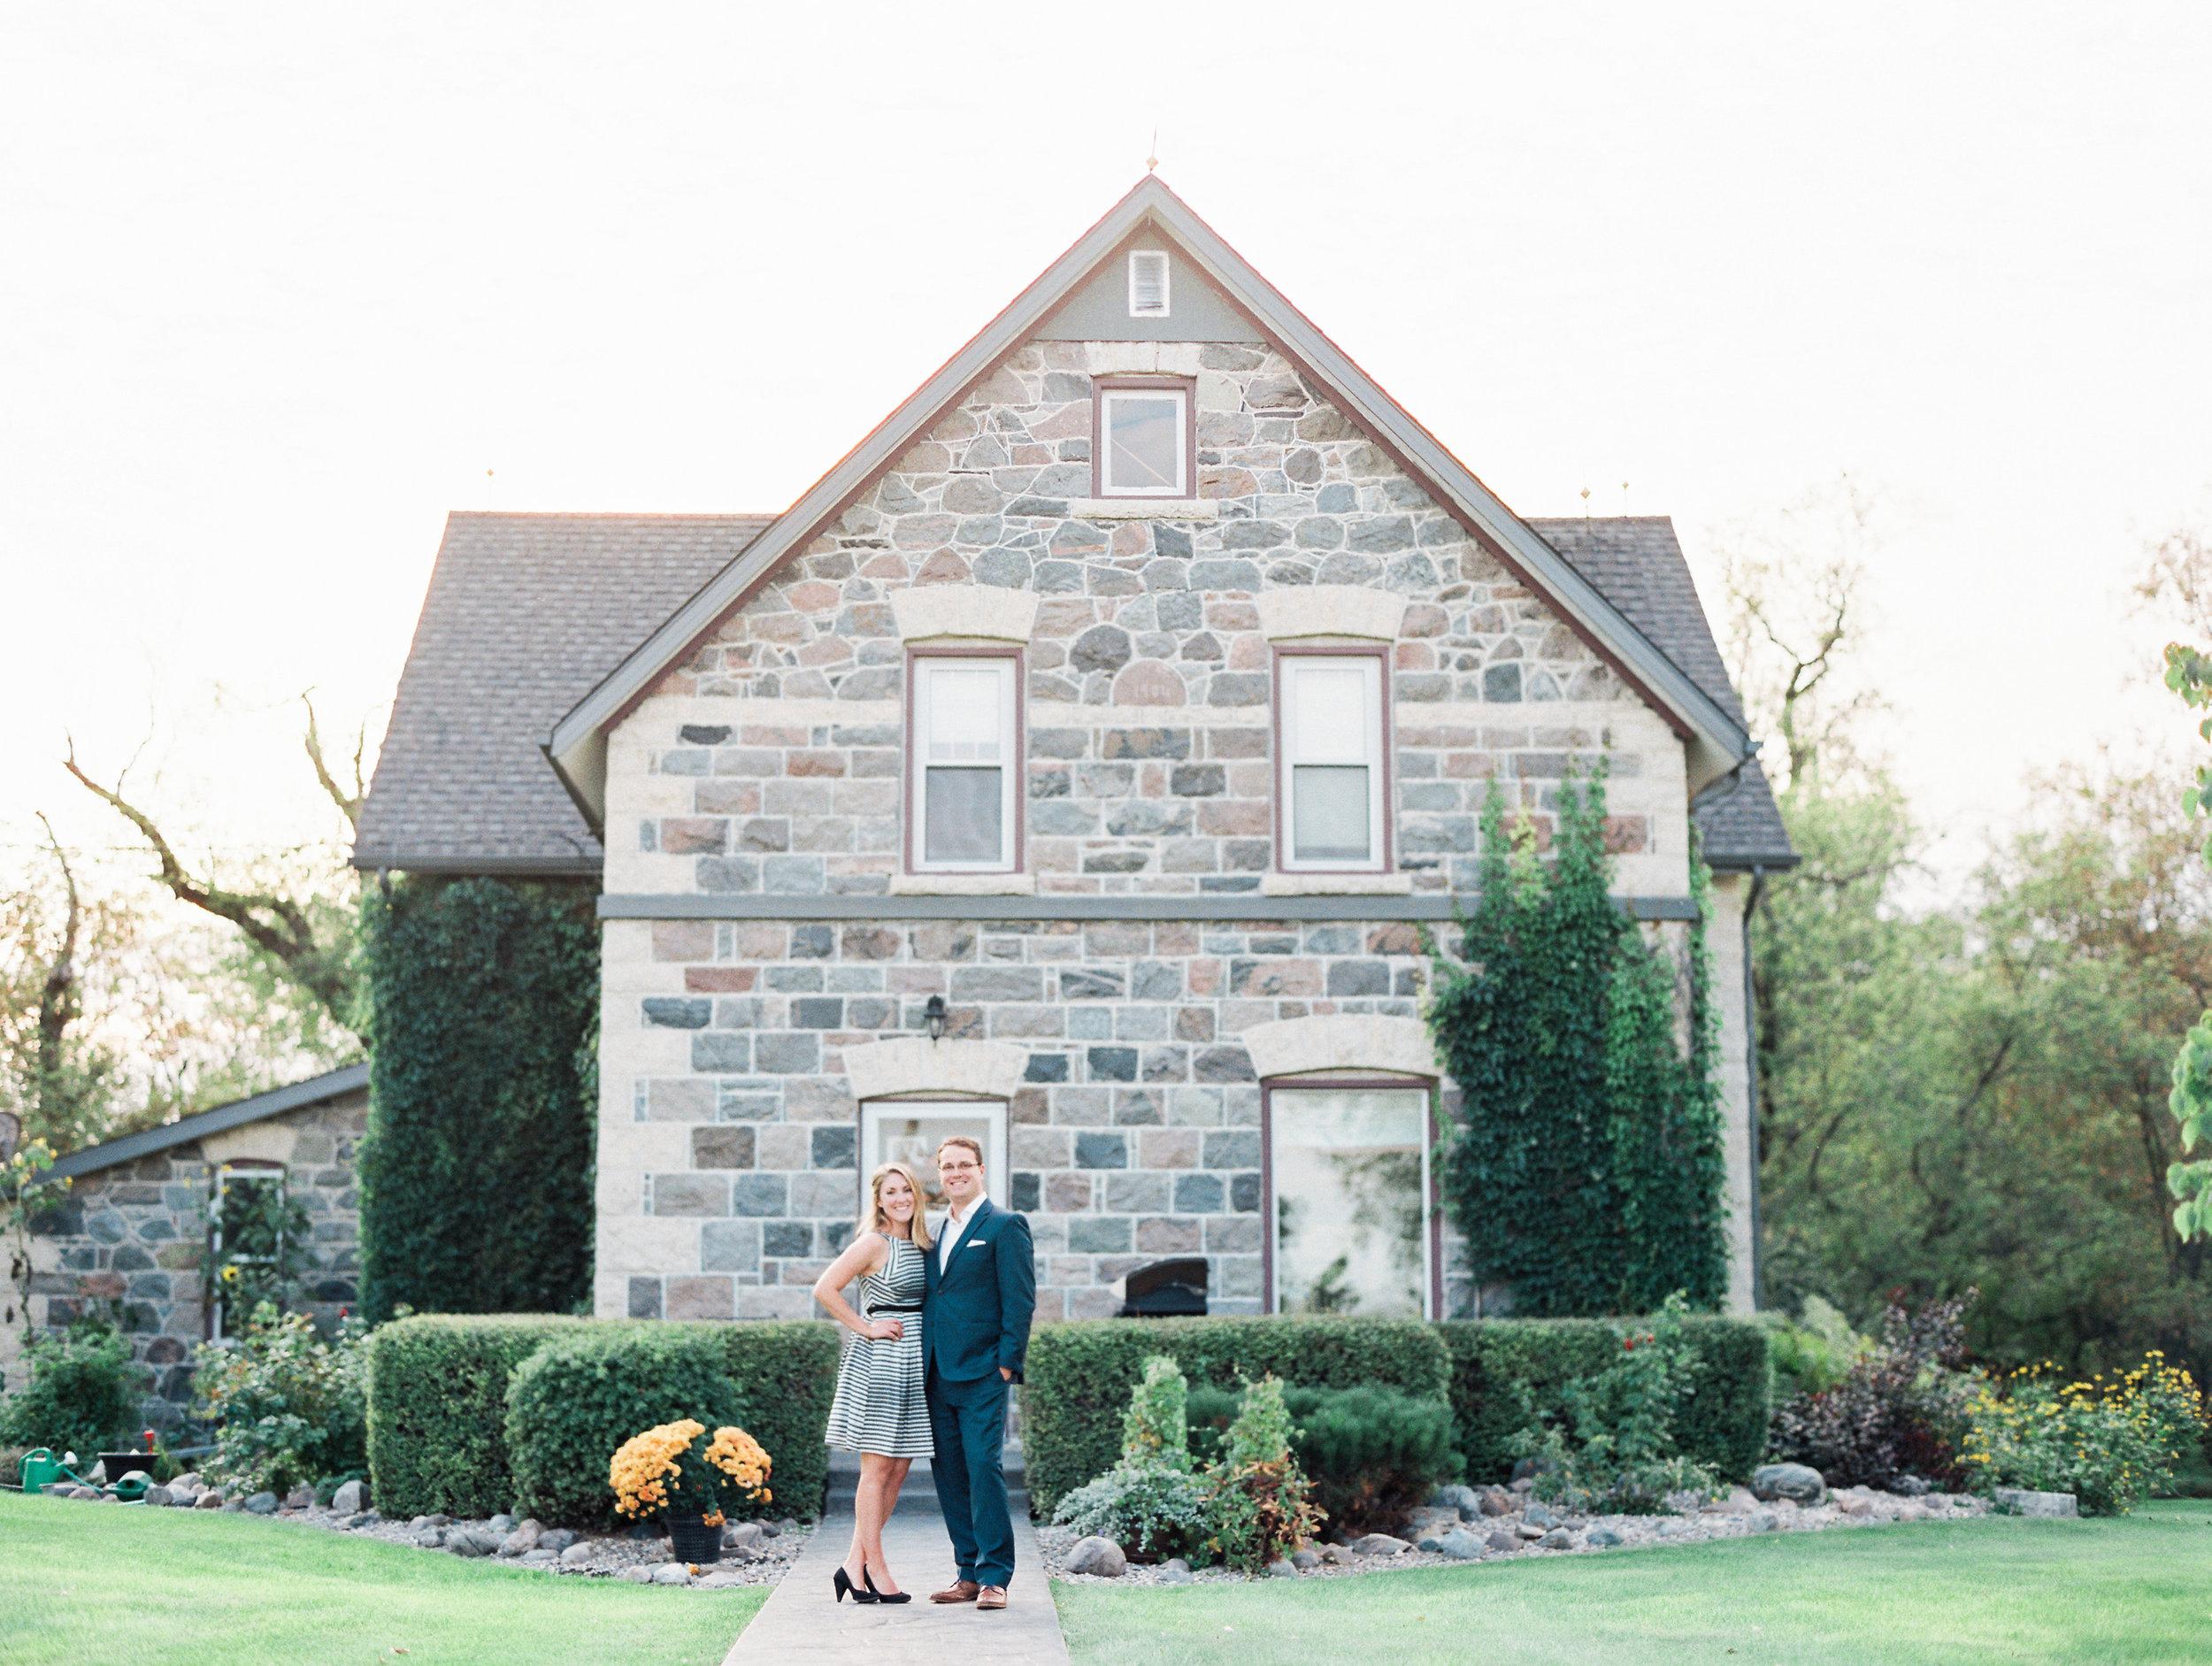 About Winnipeg Wedding Florist Stone House Creative